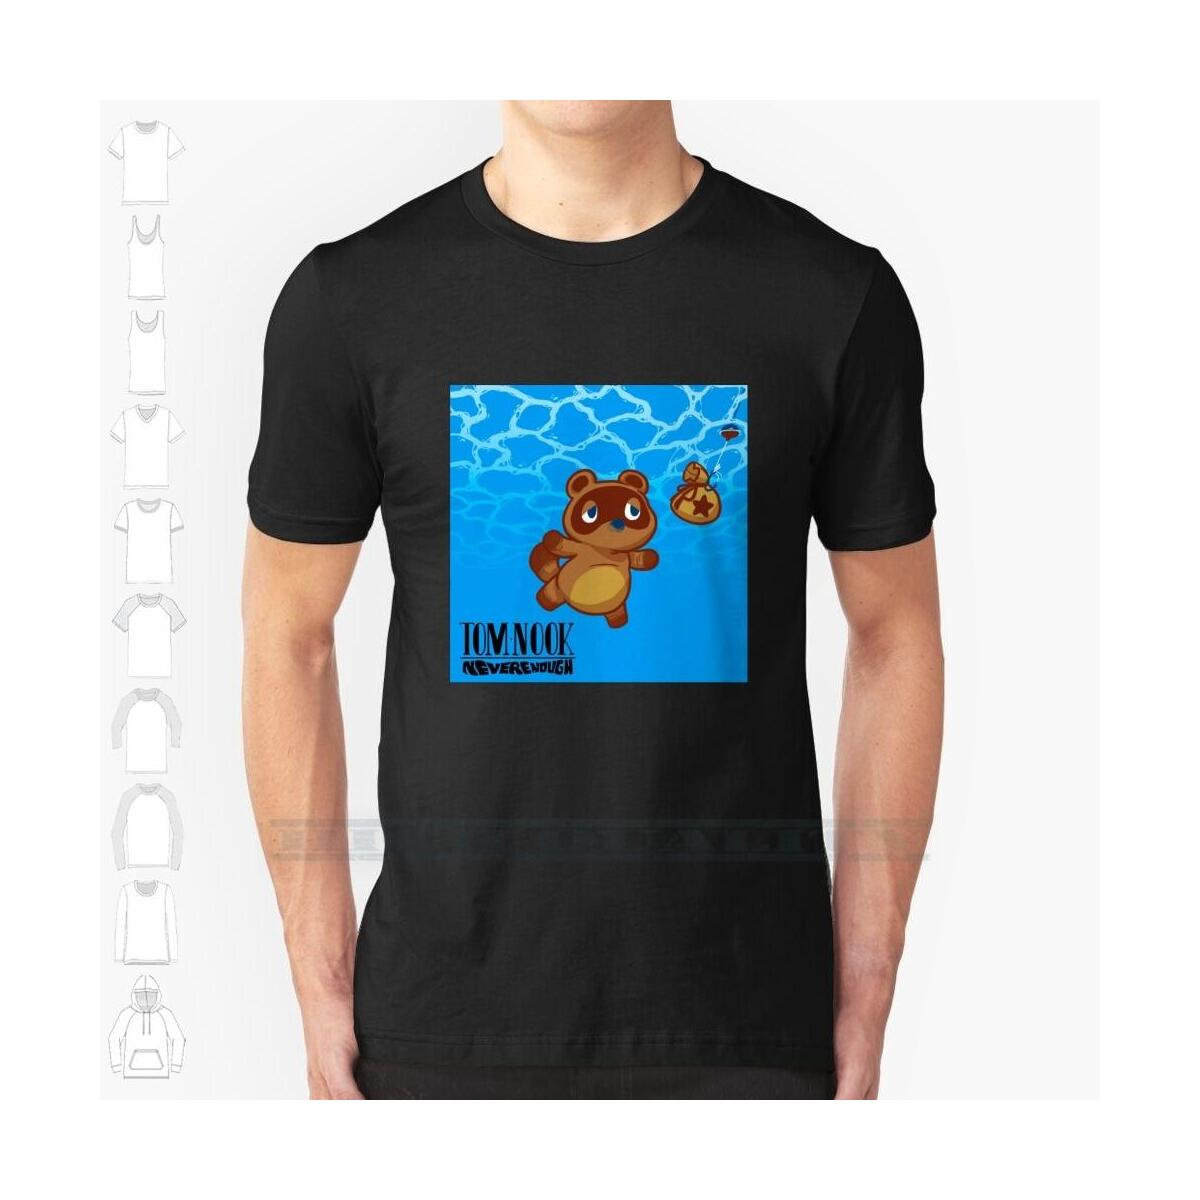 Nirvana Style Nook Shirt, MTee-Black / M